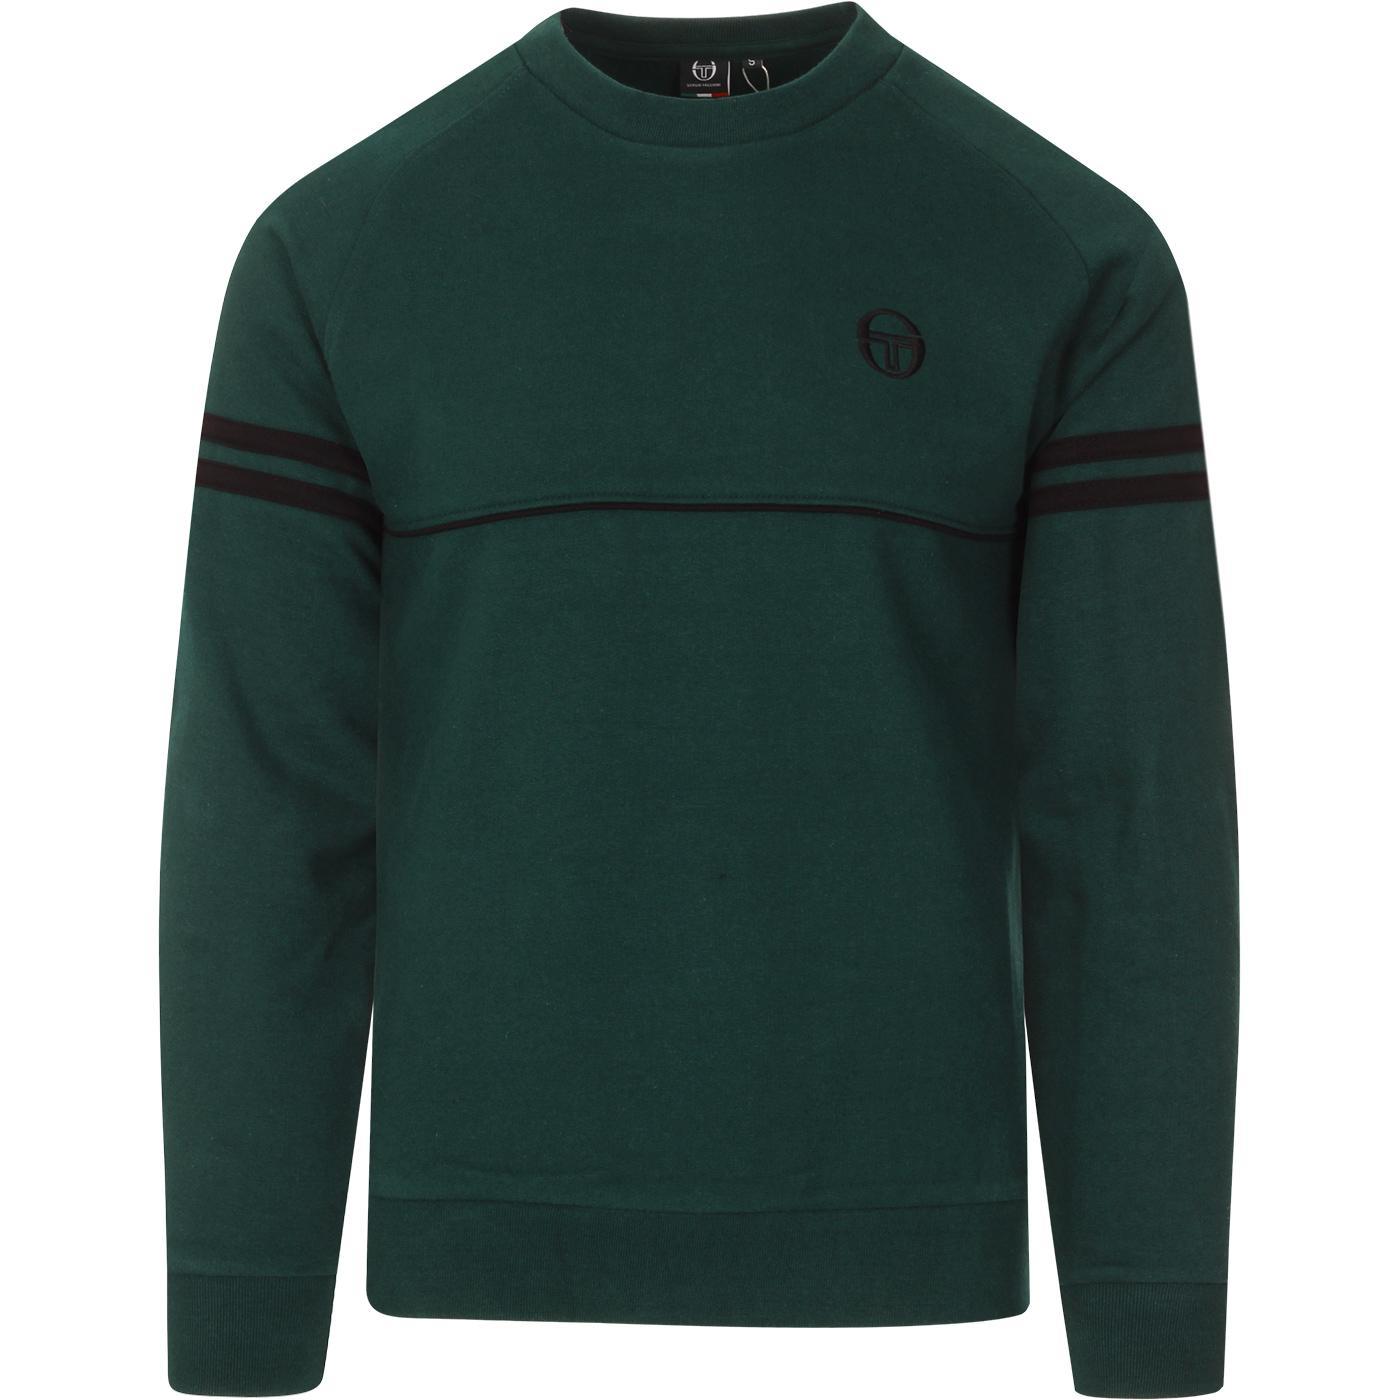 Orion SERGIO TACCHINI Retro 80s Sweatshirt (B/B)